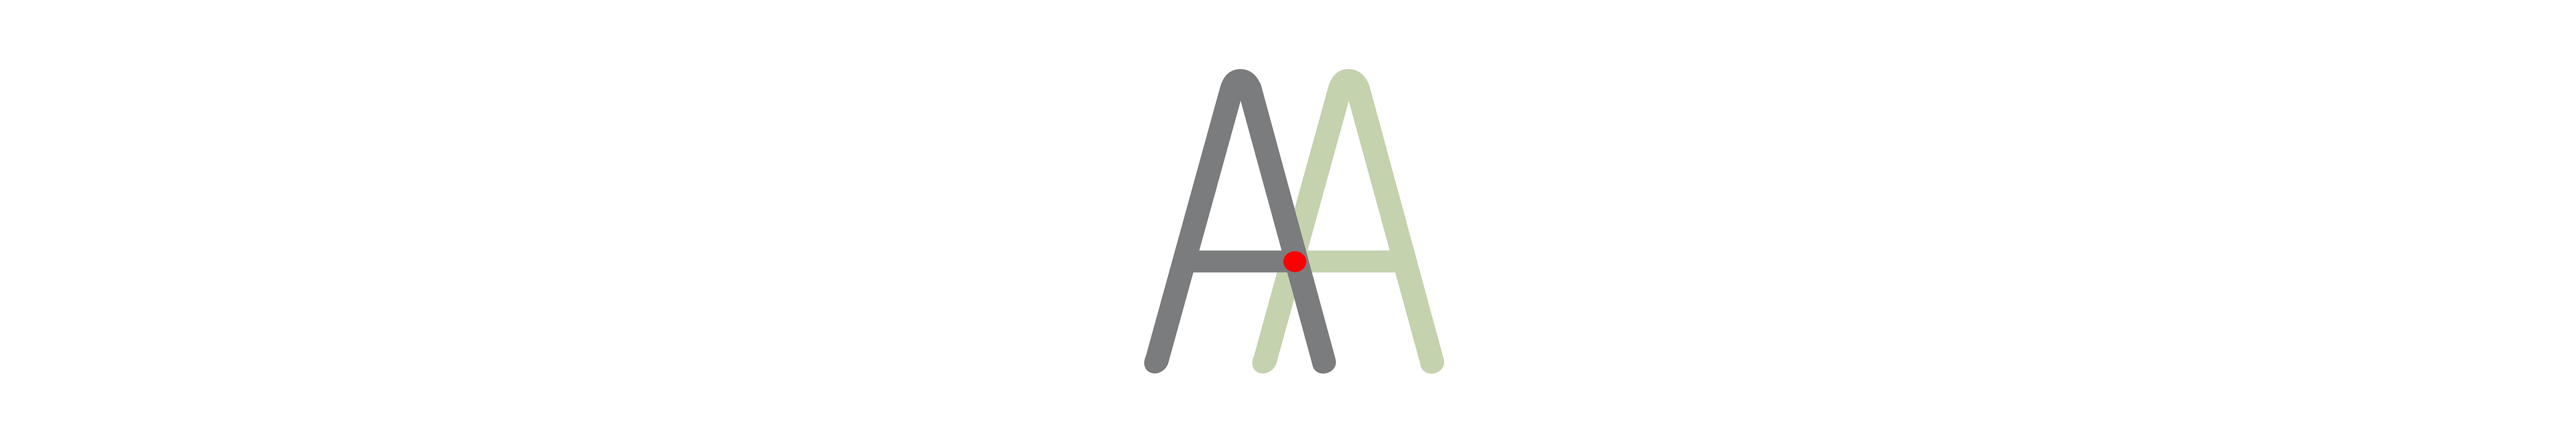 Logovignette Aden bas page site